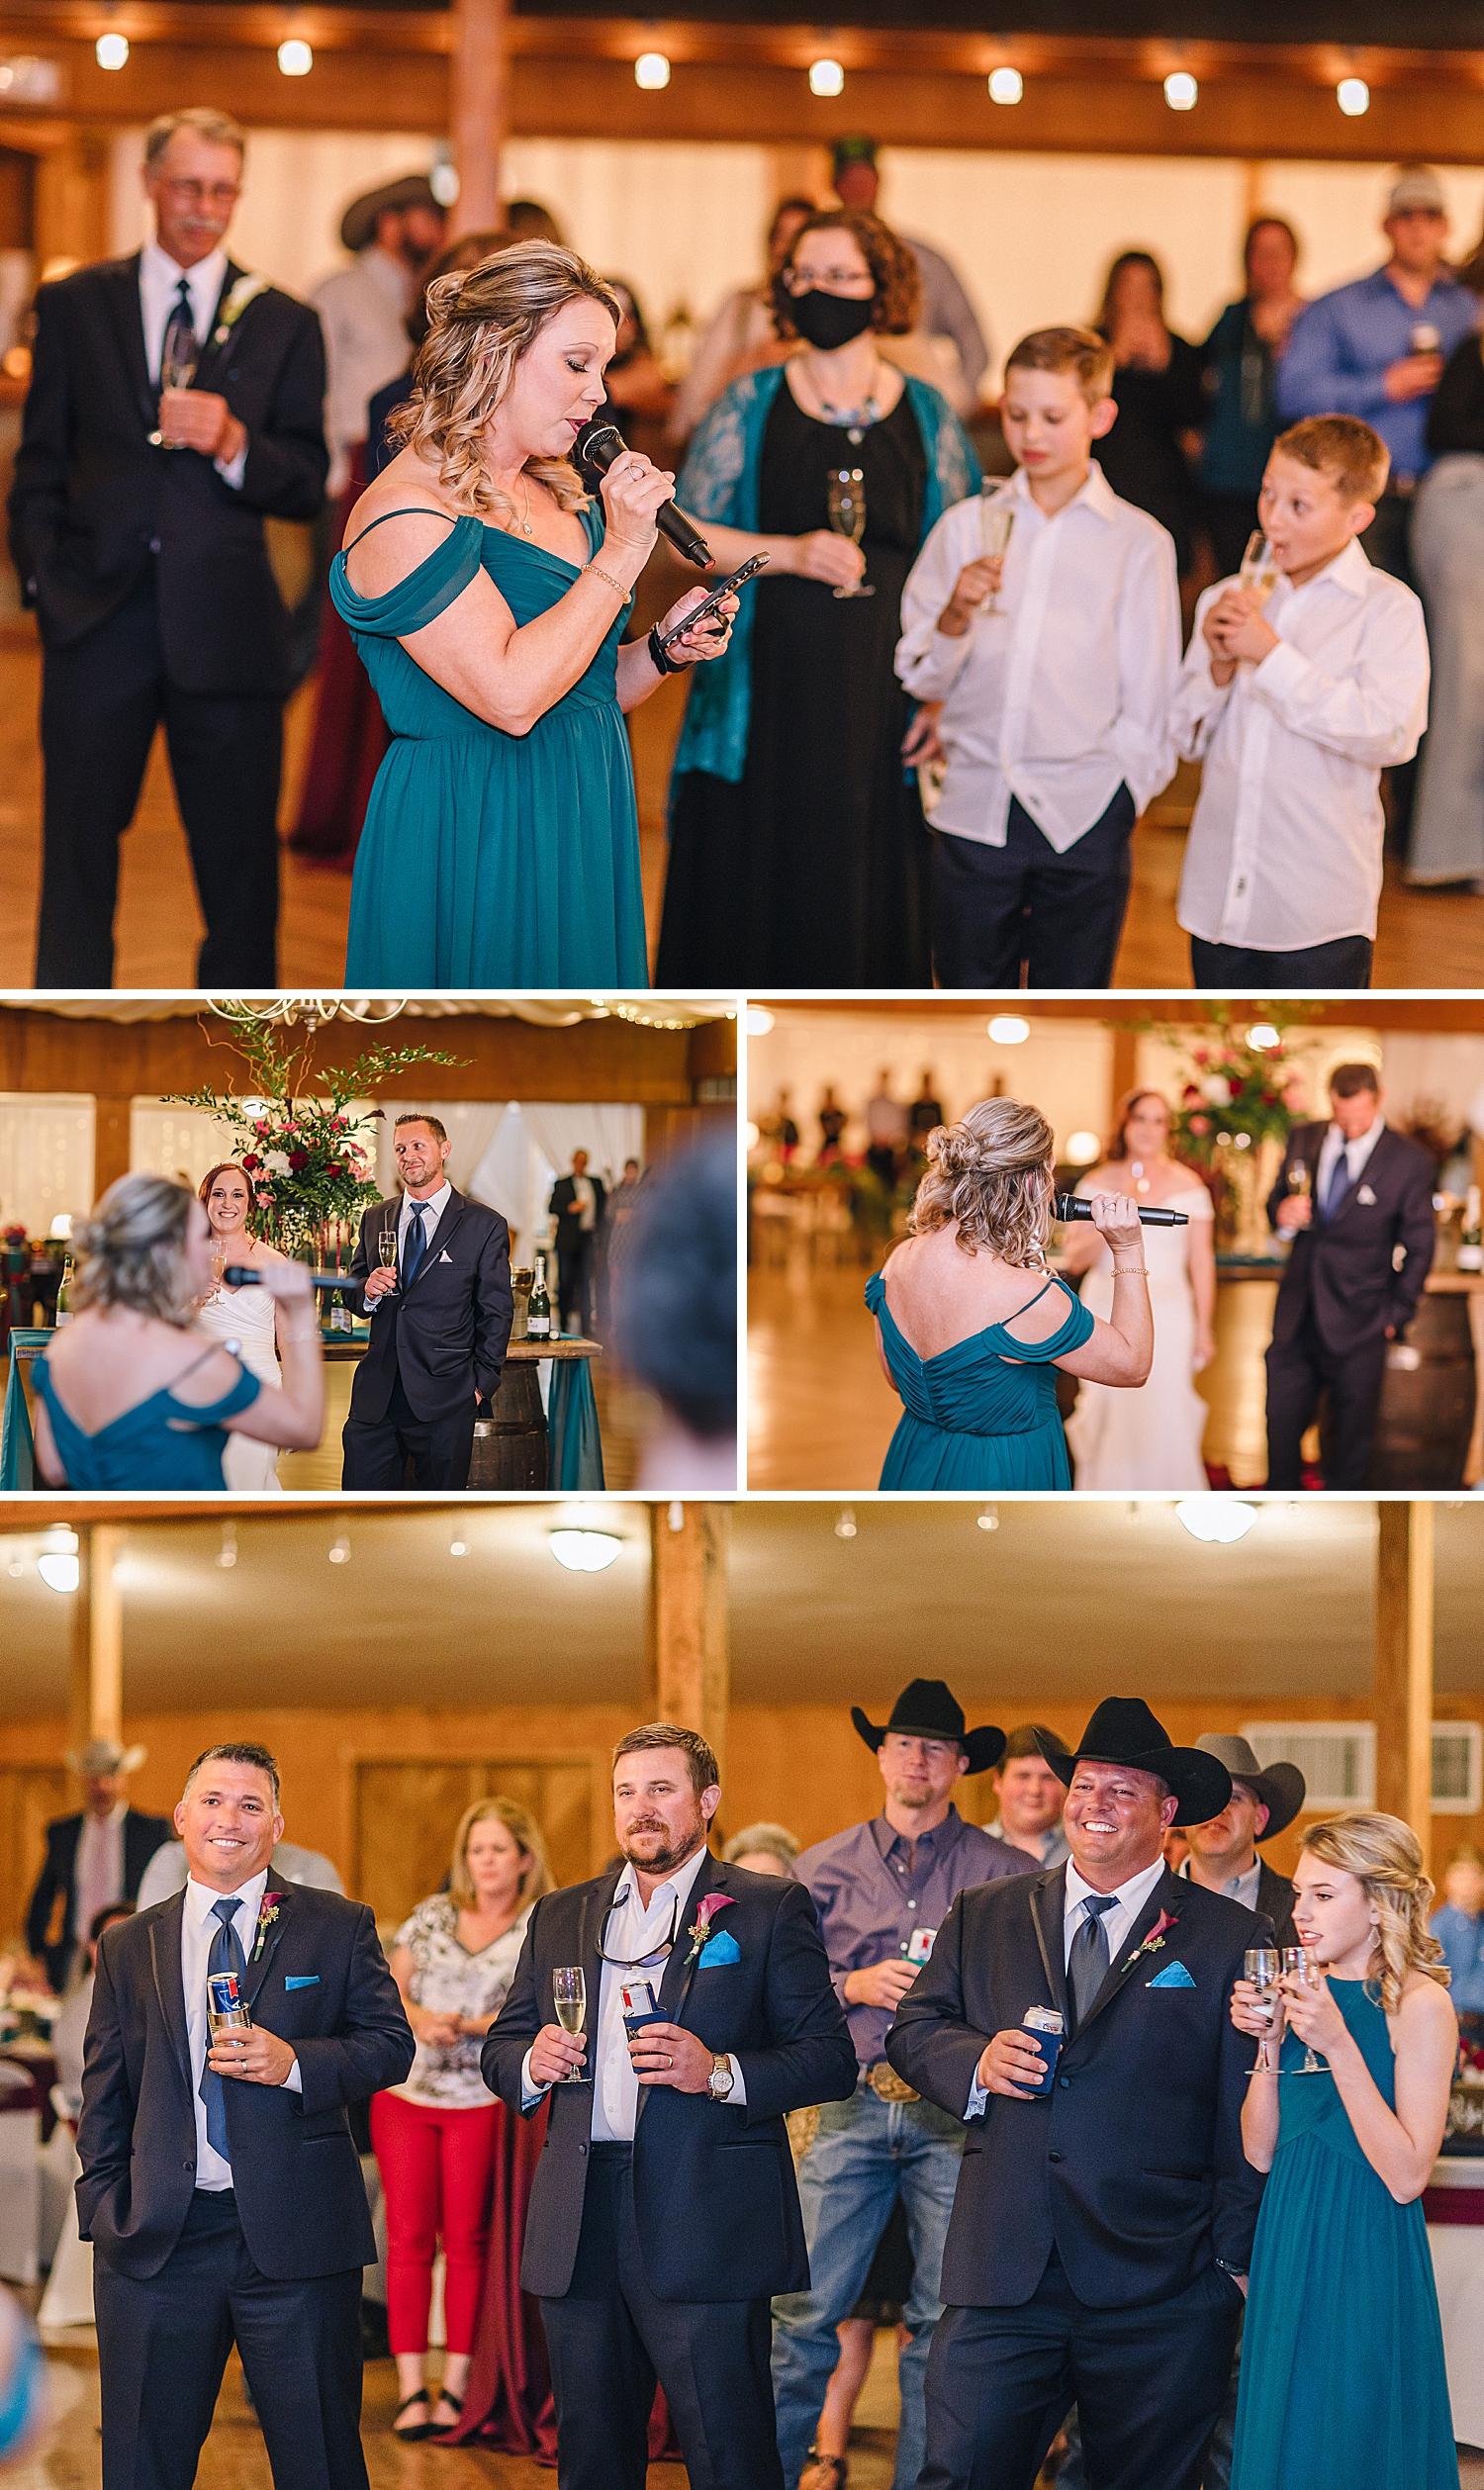 Jewel-Tone-Texas-Wedding-Valerie-Jason-Carly-Barton-Photography_0084.jpg